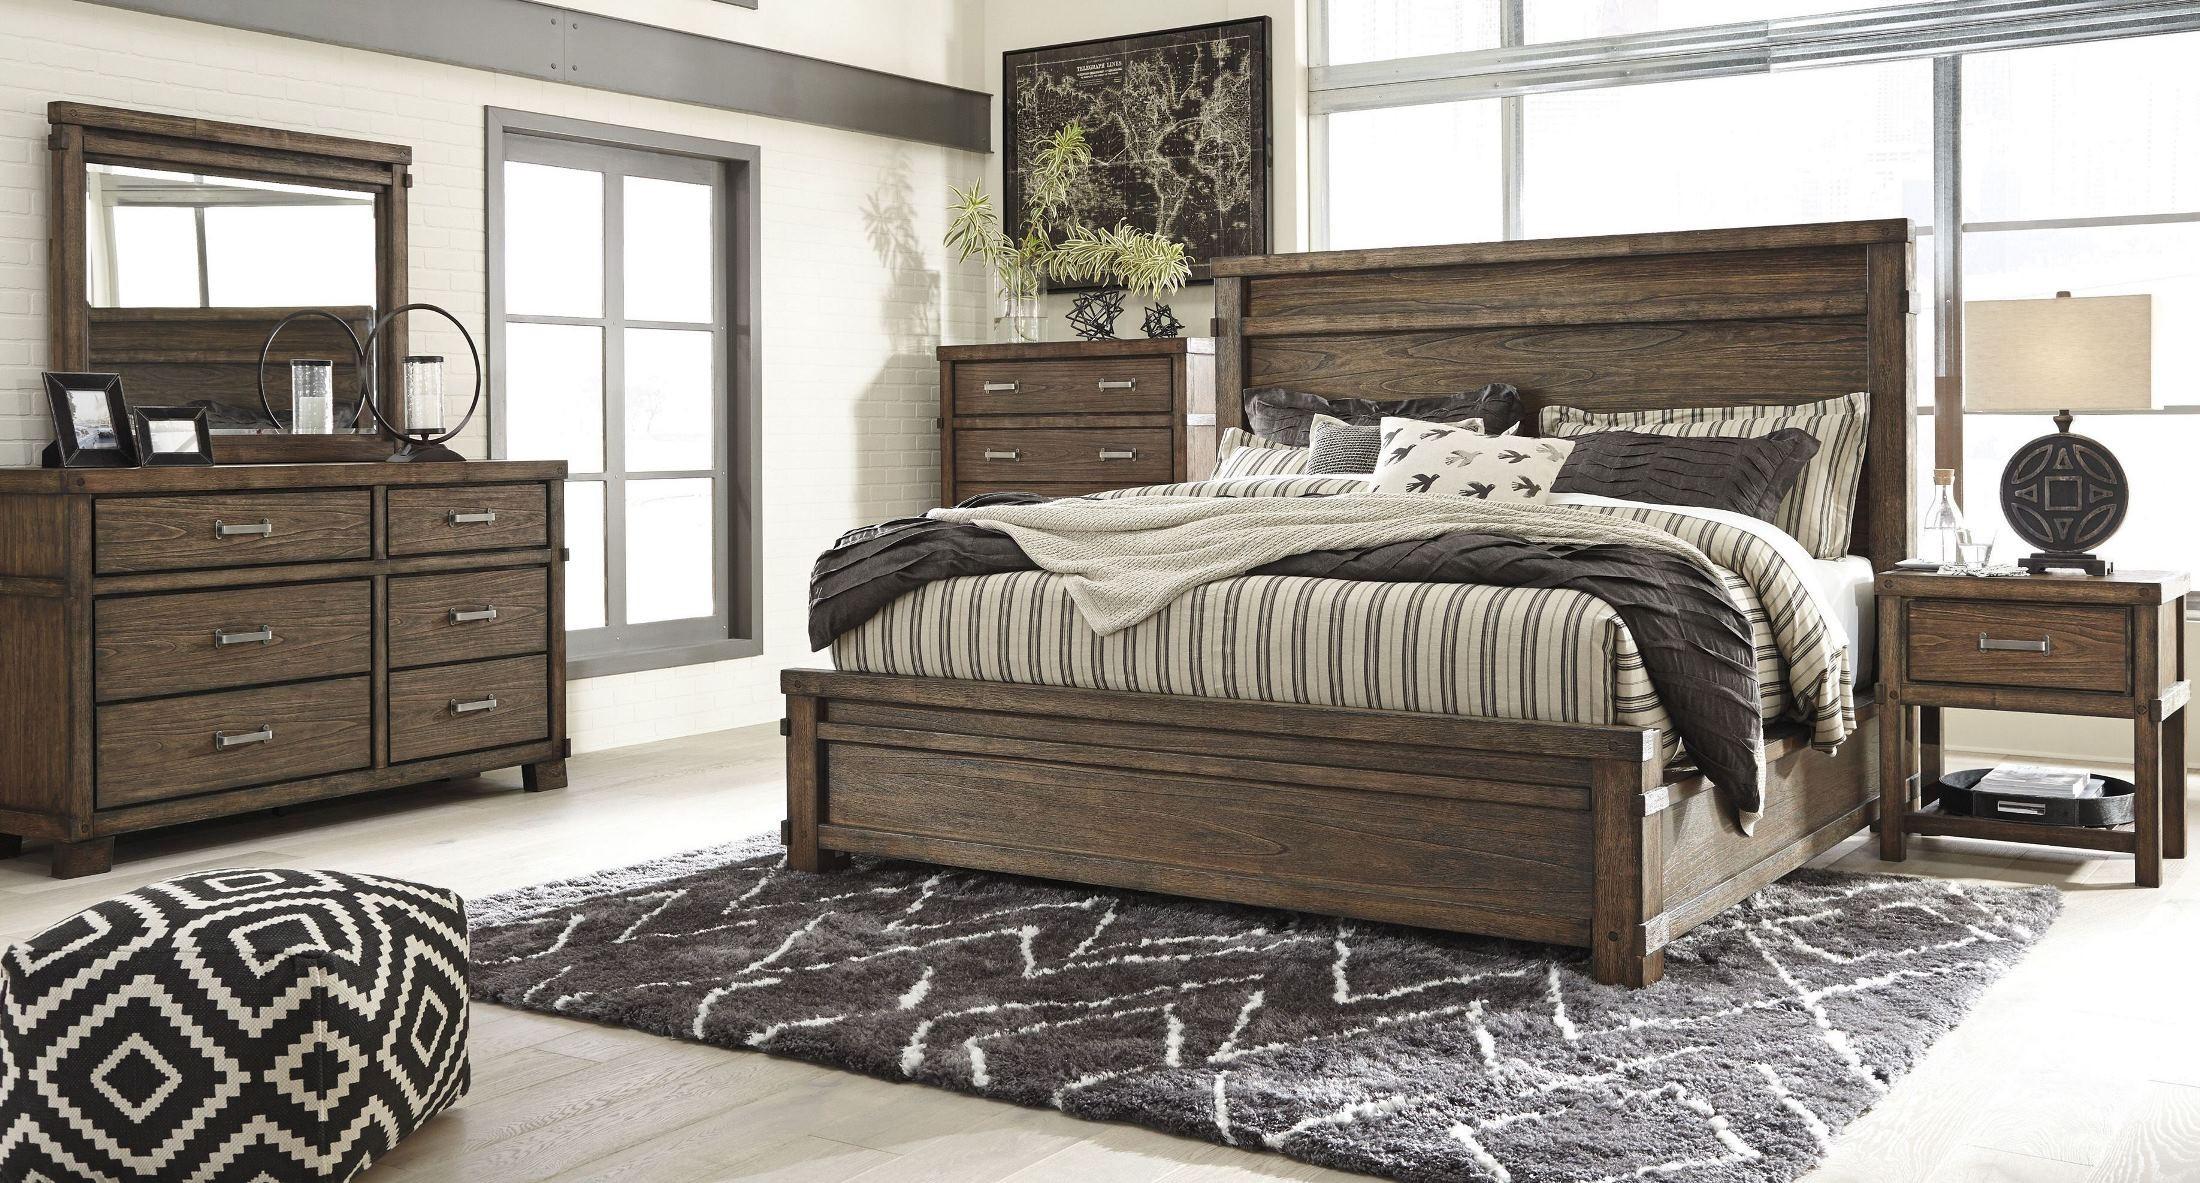 Leystone Dark Brown Panels Bedroom Set, B614-81-96, Ashley